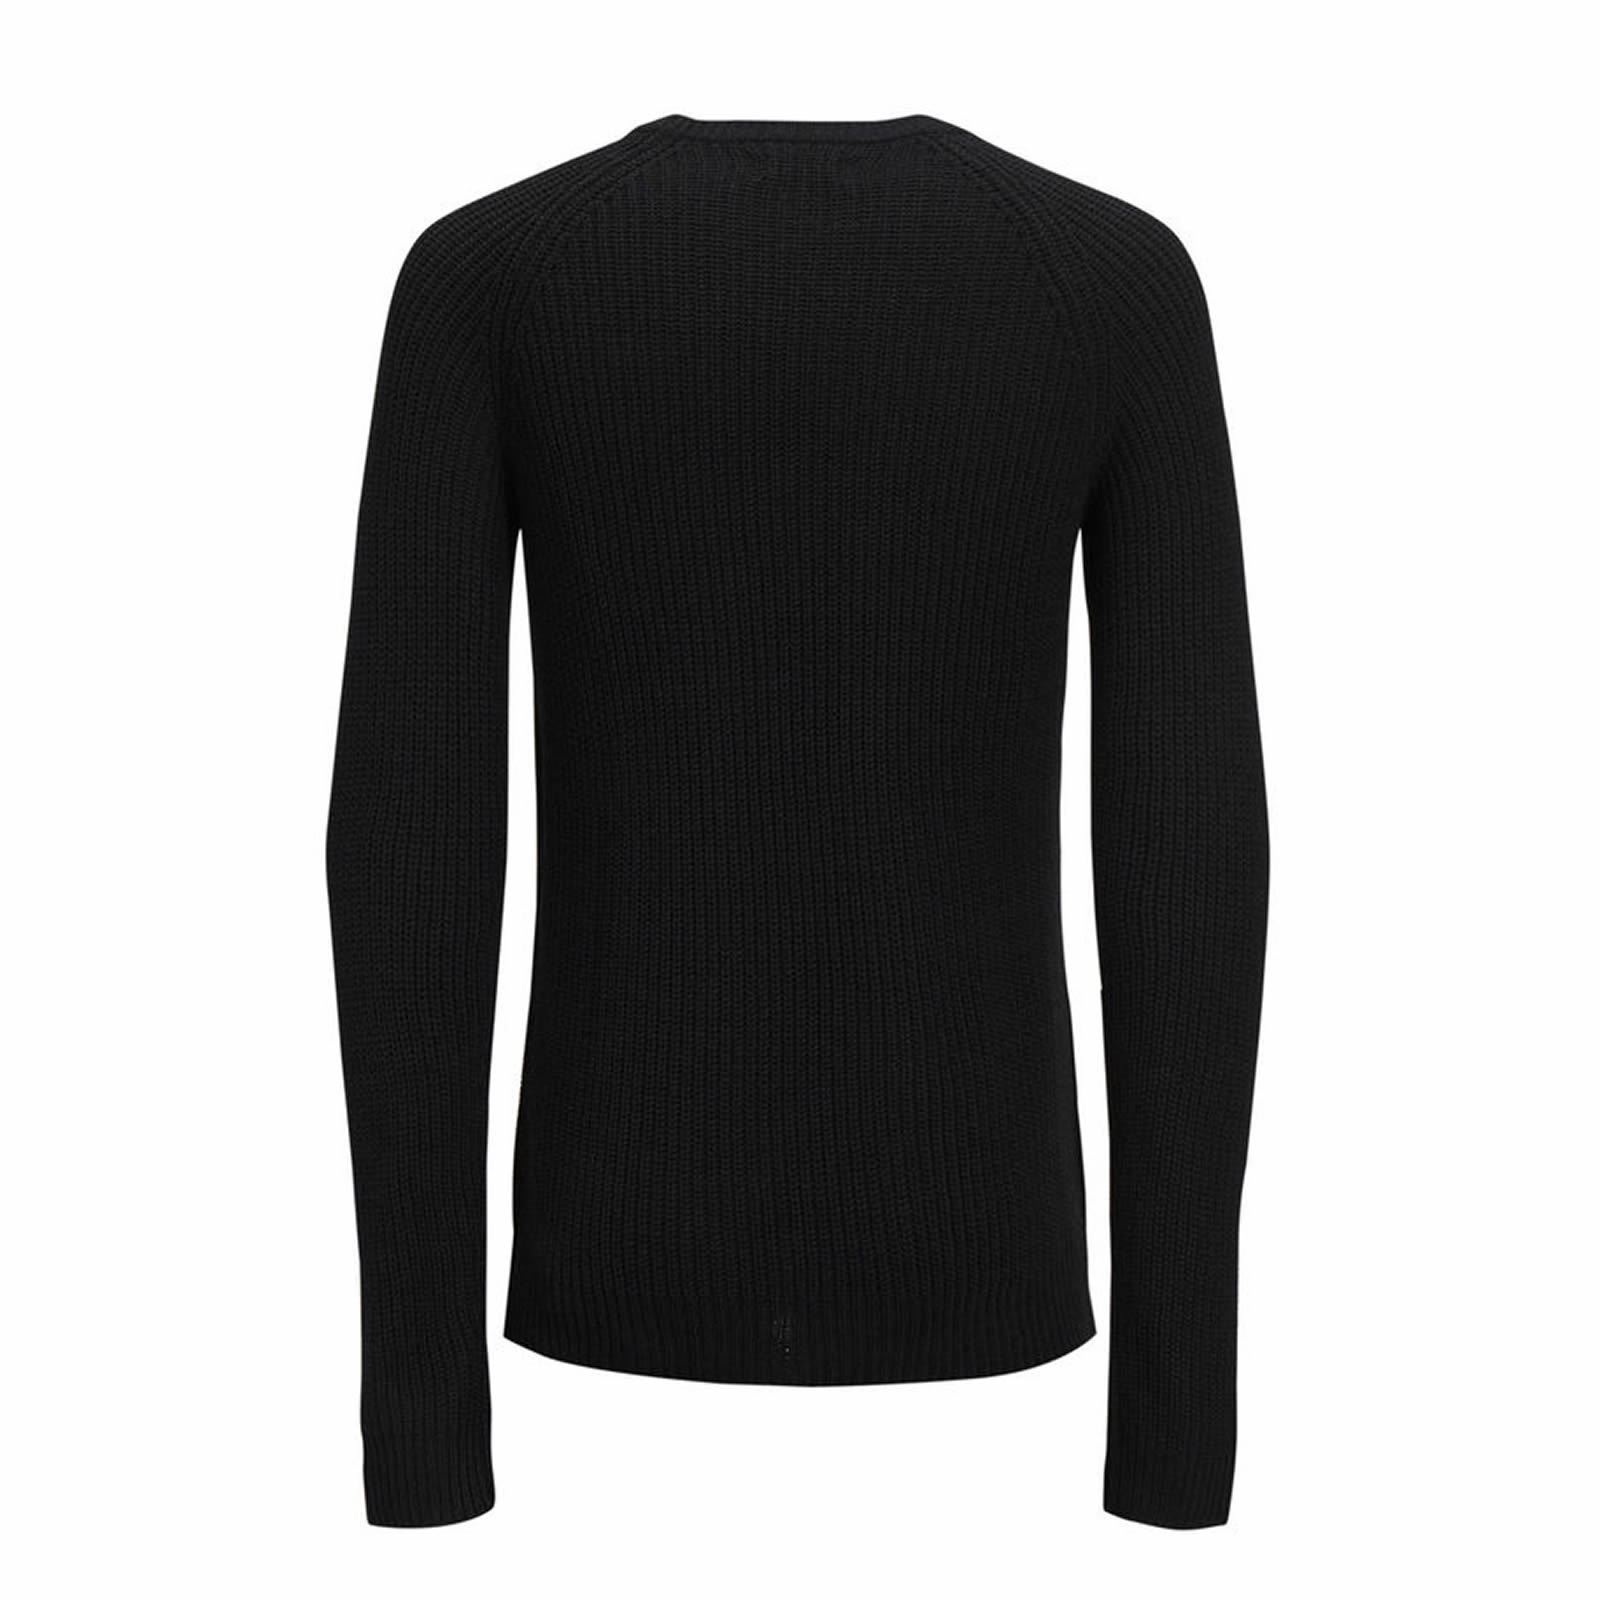 Jack-amp-Jones-Panneau-Pull-homme-a-encolure-ras-du-cou-Long-Tricot-Pull-Over-Sweater miniature 5